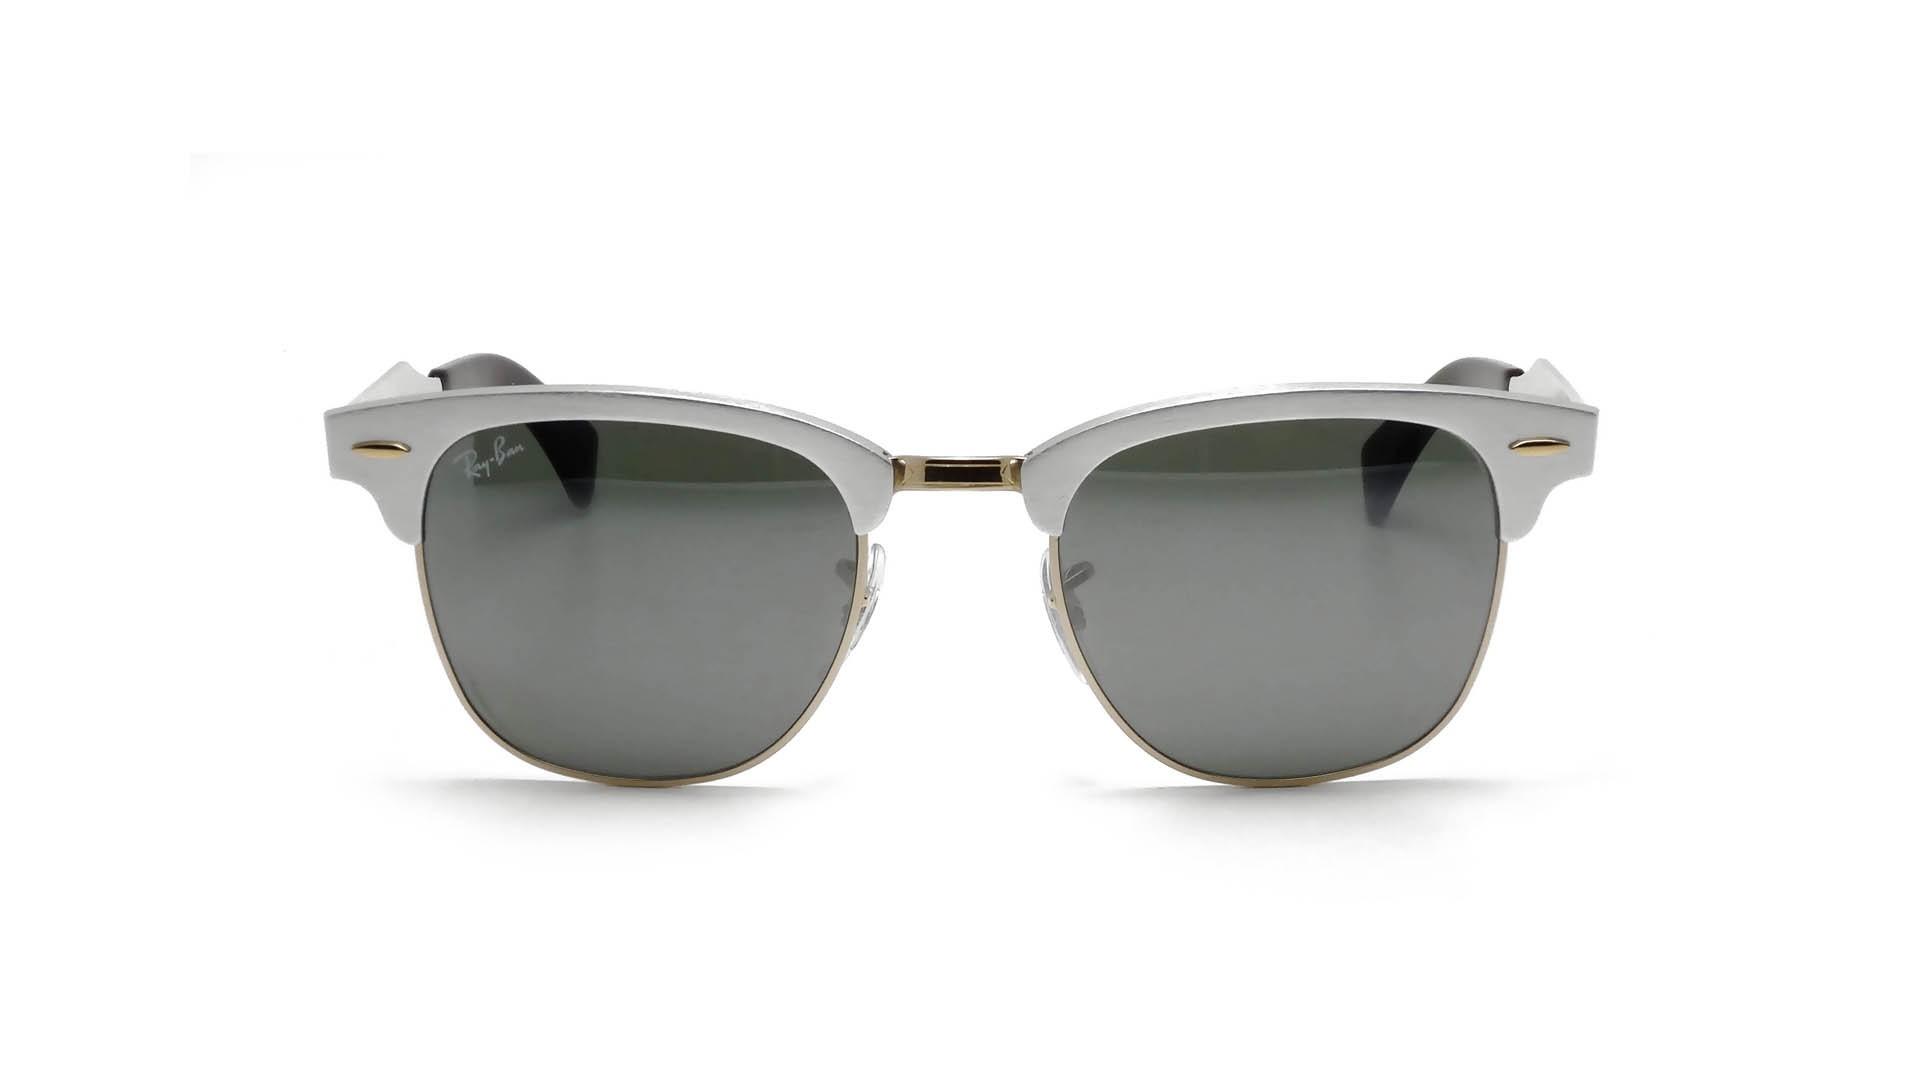 5bd811031f9 Sunglasses Ray-Ban Clubmaster Aluminium Silver RB3507 137 40 49-21 Medium  Gradient Mirror